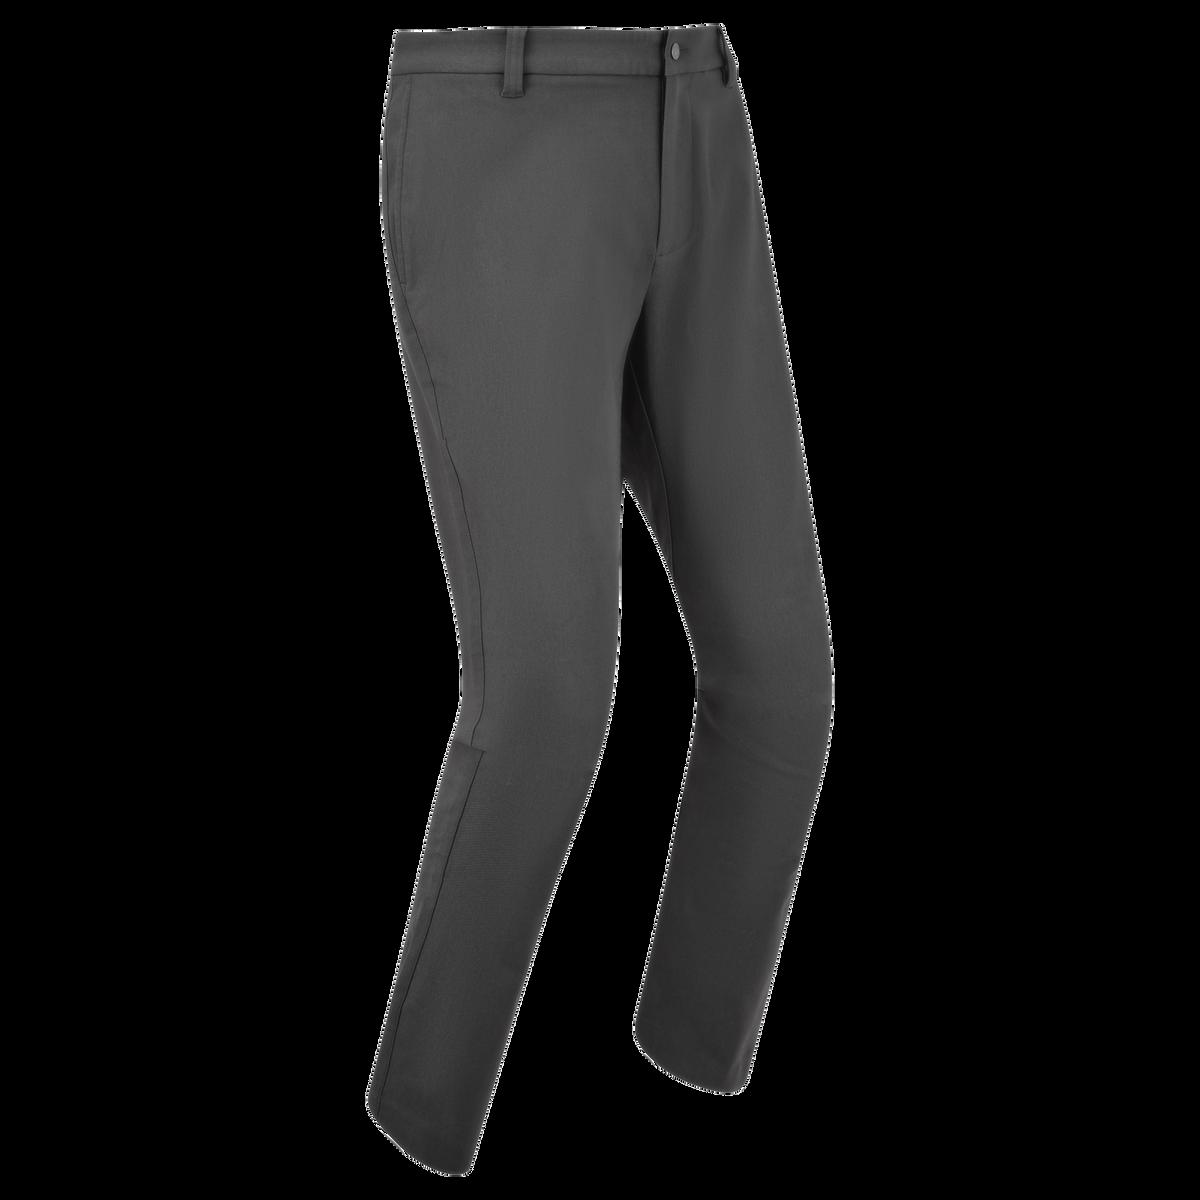 FJ Performance Xtreme trousers